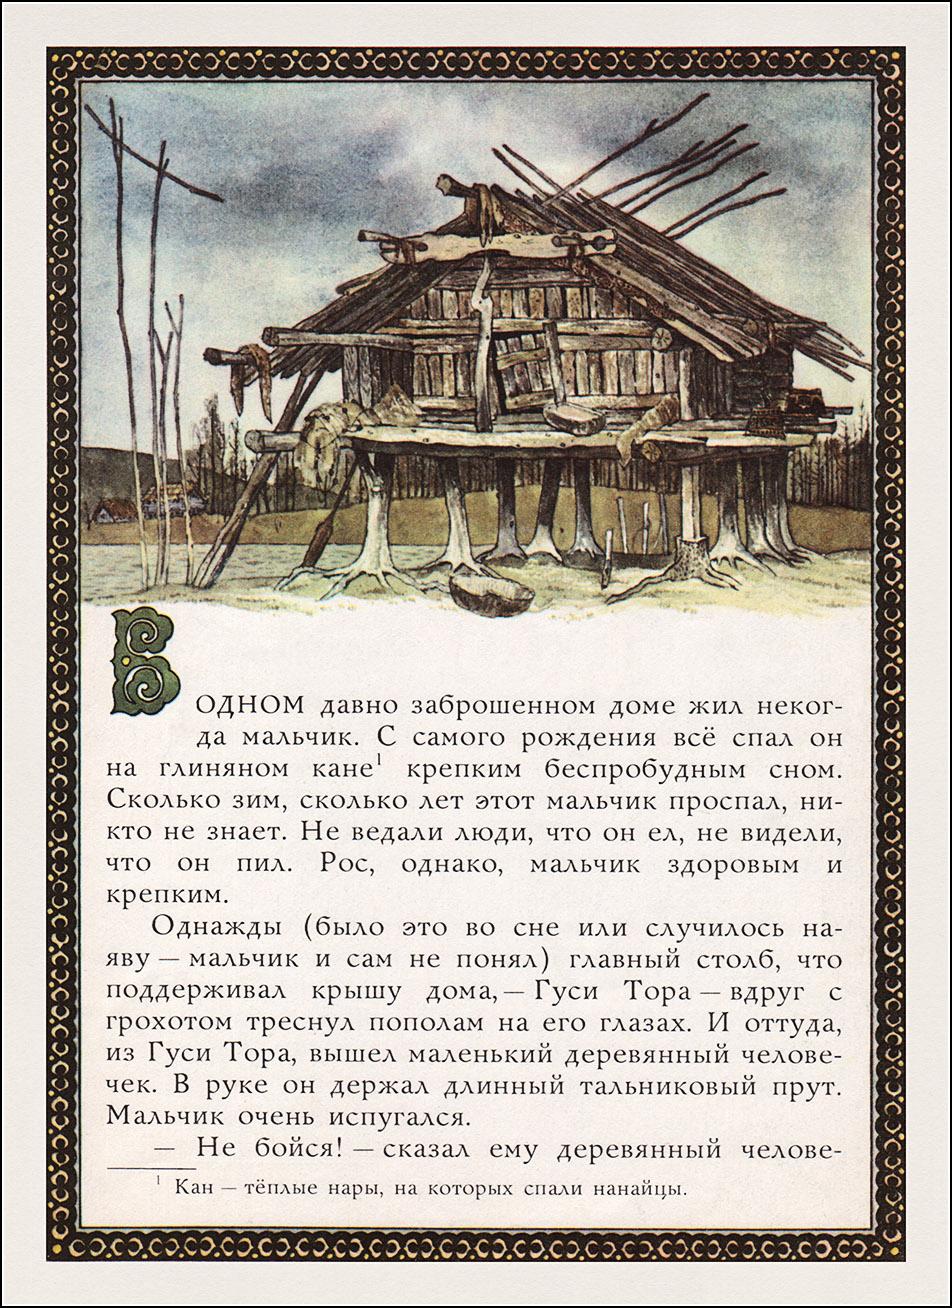 Г. Павлишин, Гарпамди - меткий стрелок